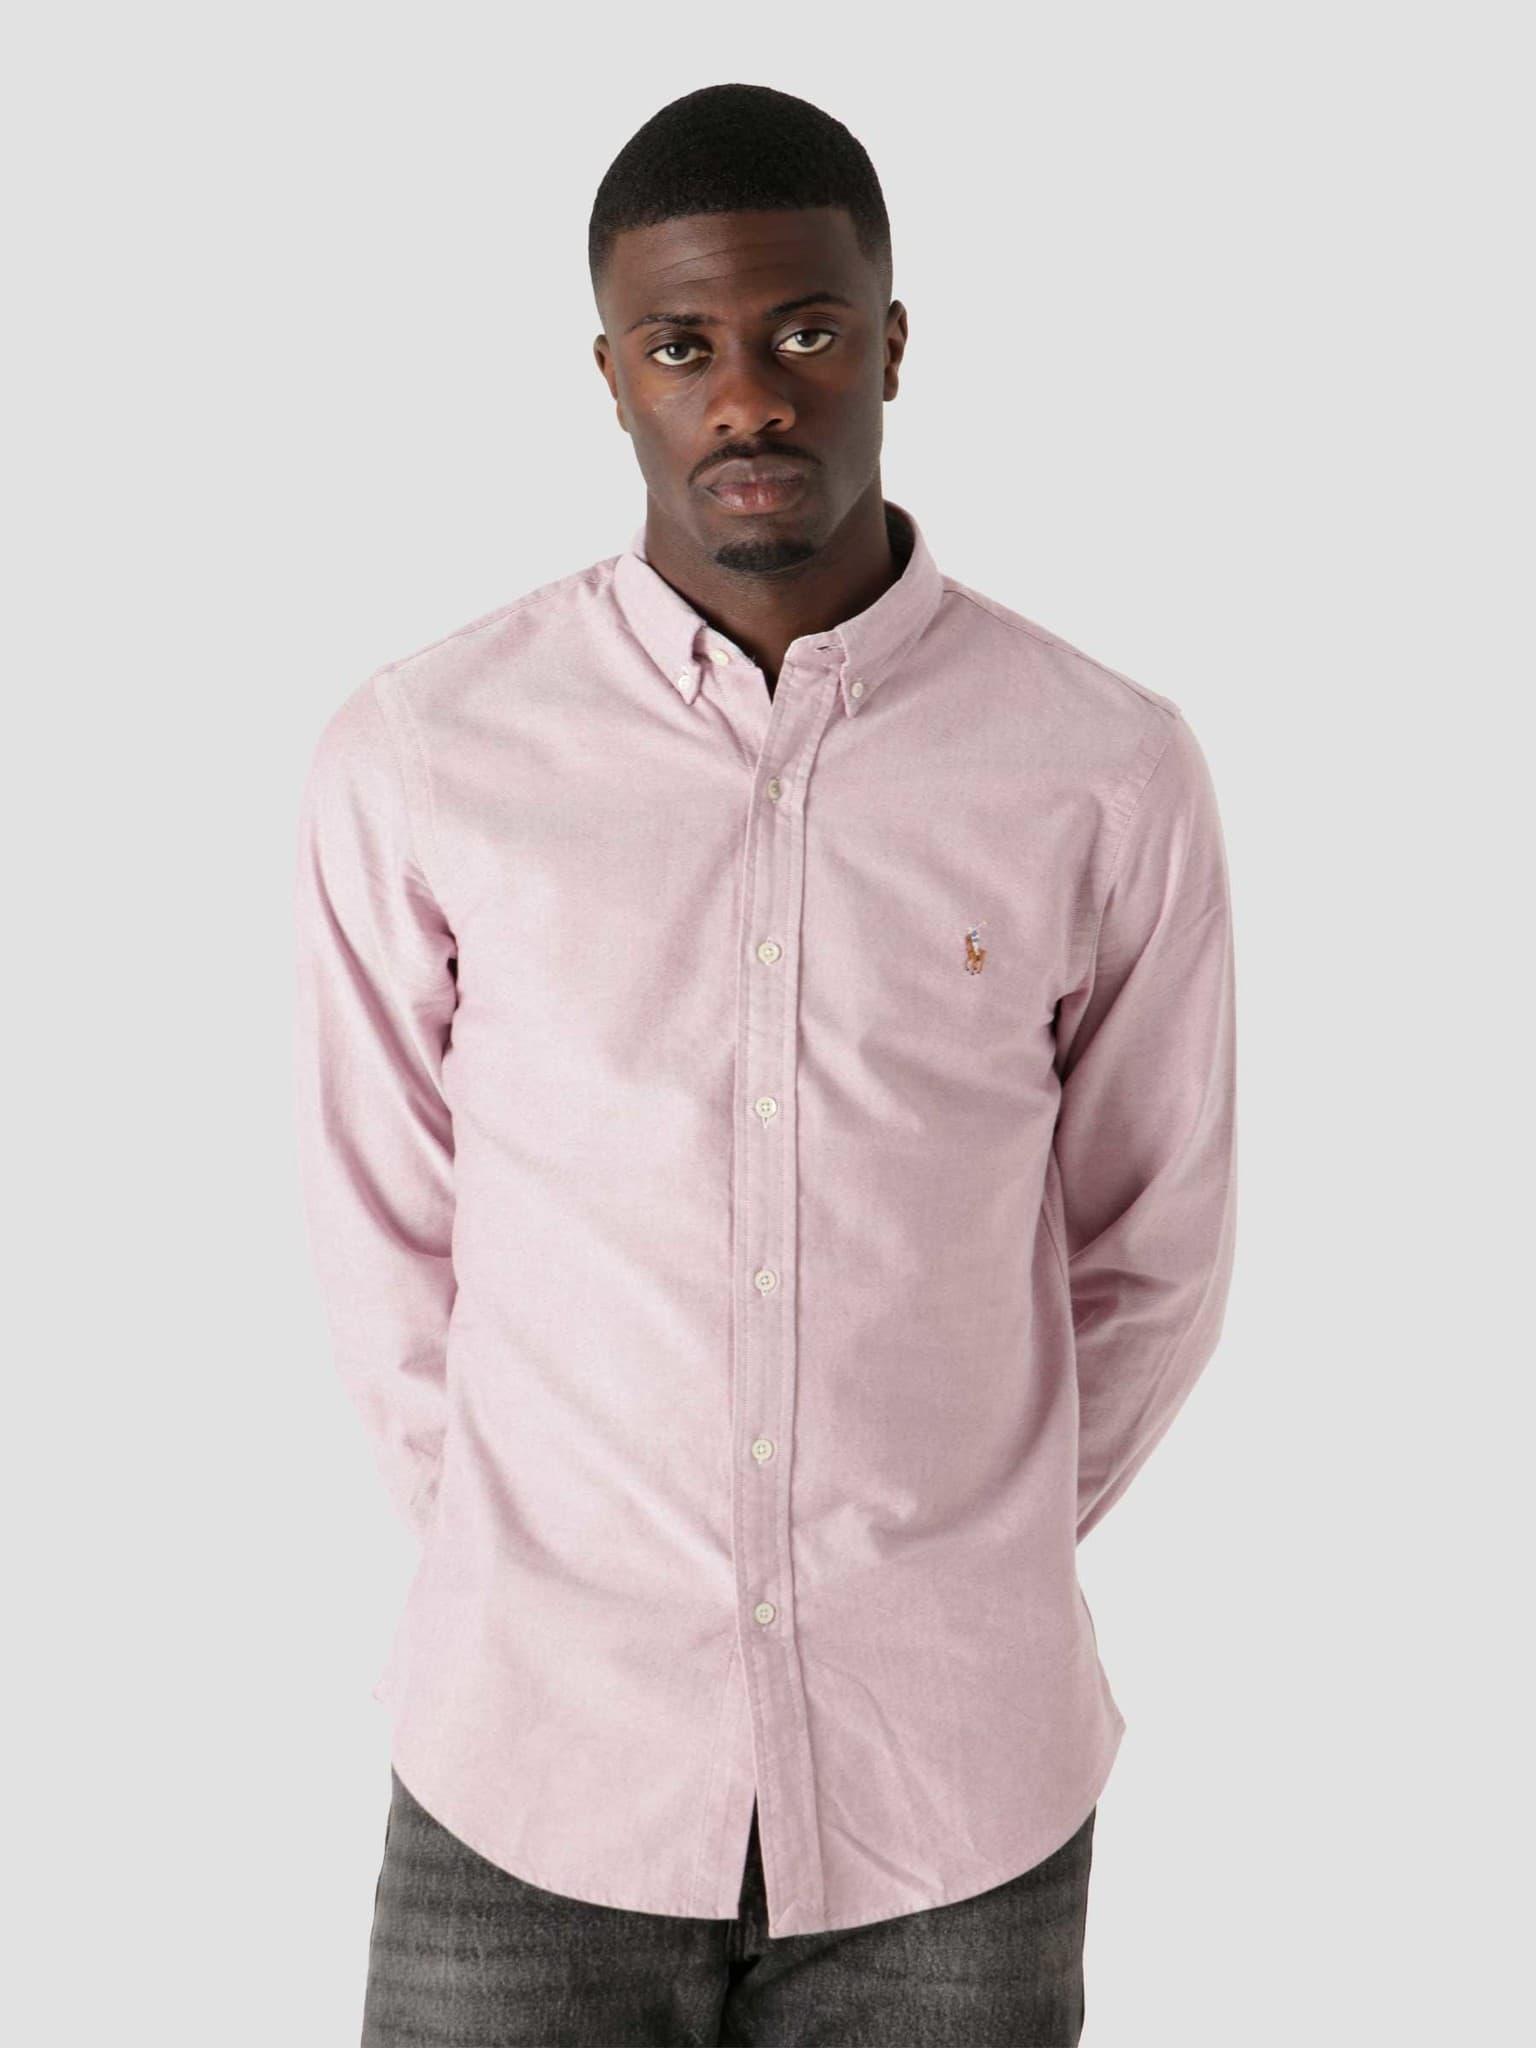 Classic Oxford Shirt 2535C Crimson White 710852660001